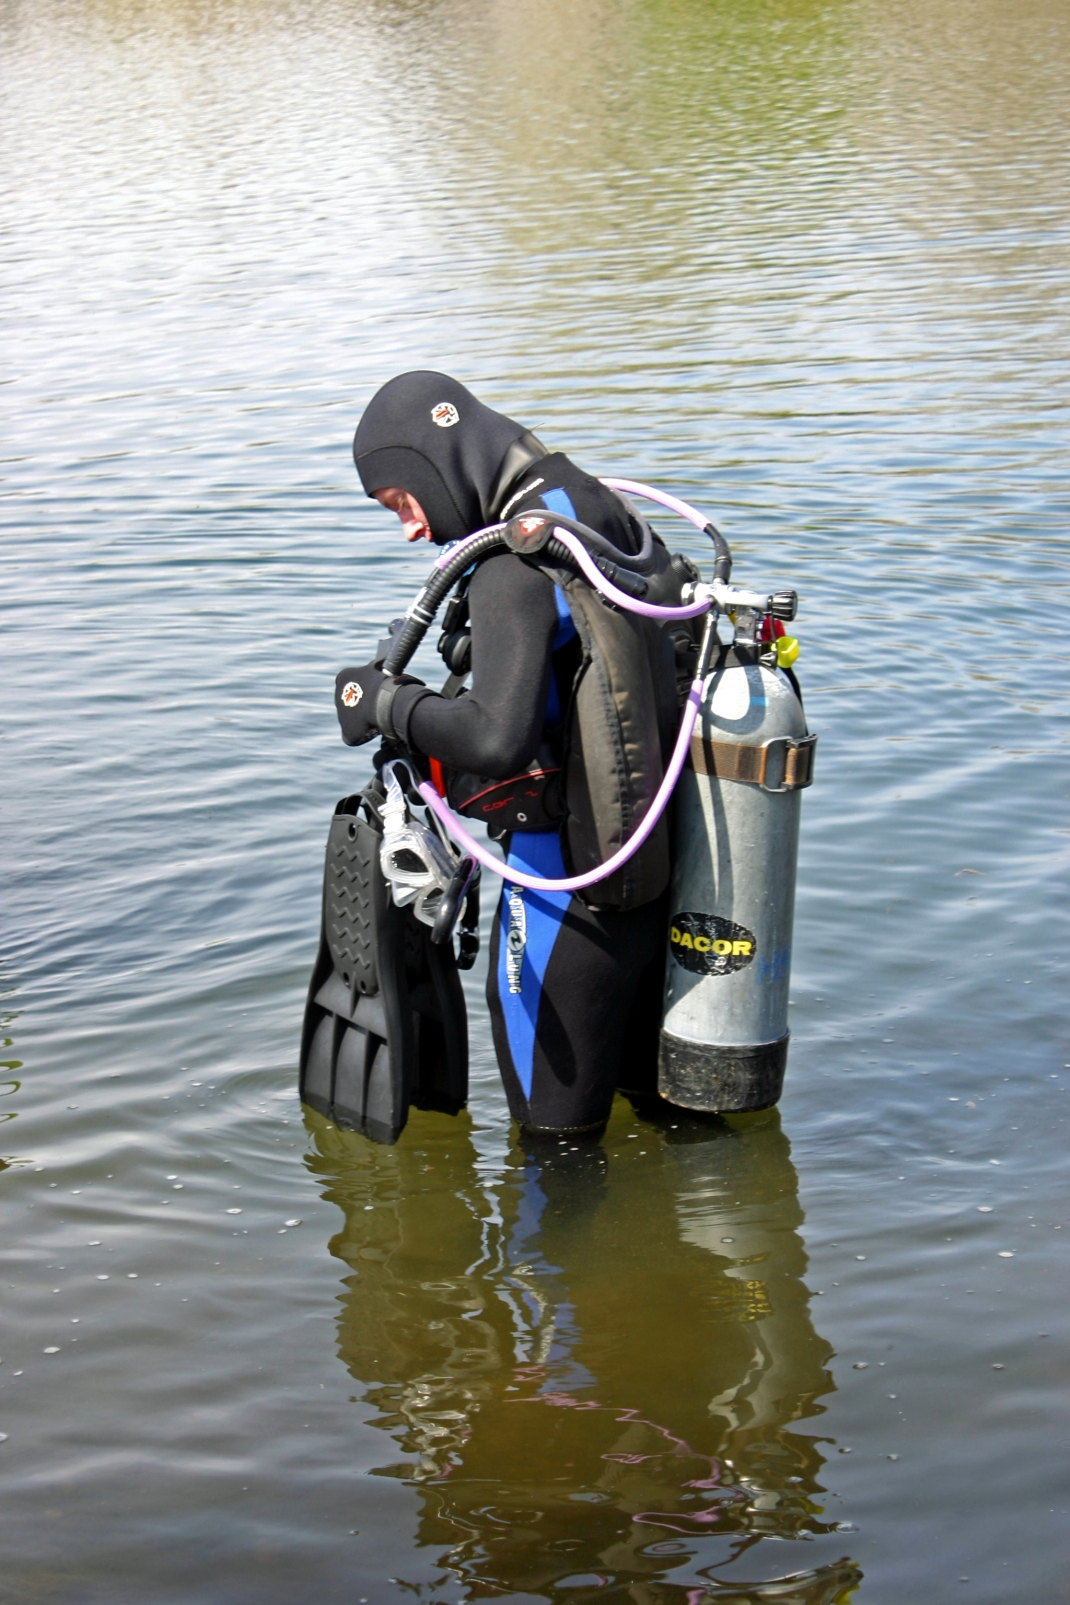 Matt took a search and rescue class in Kearney